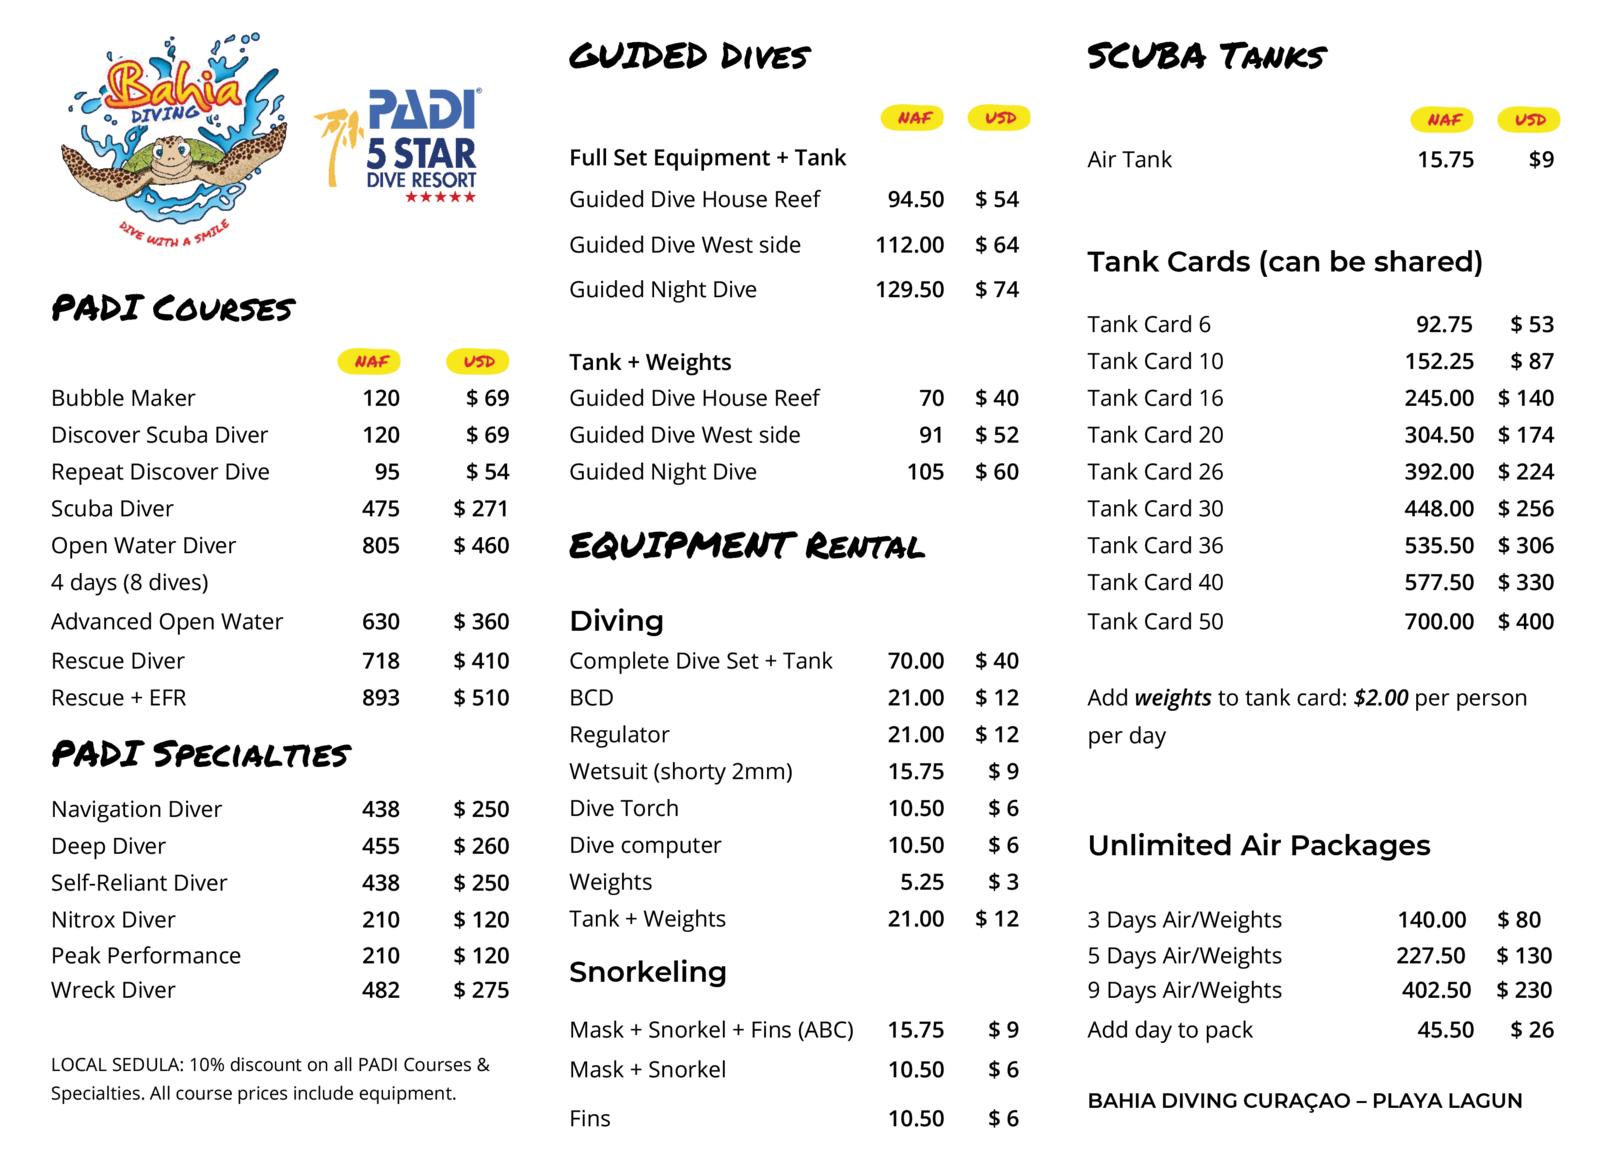 Bahia Diving Pricelist